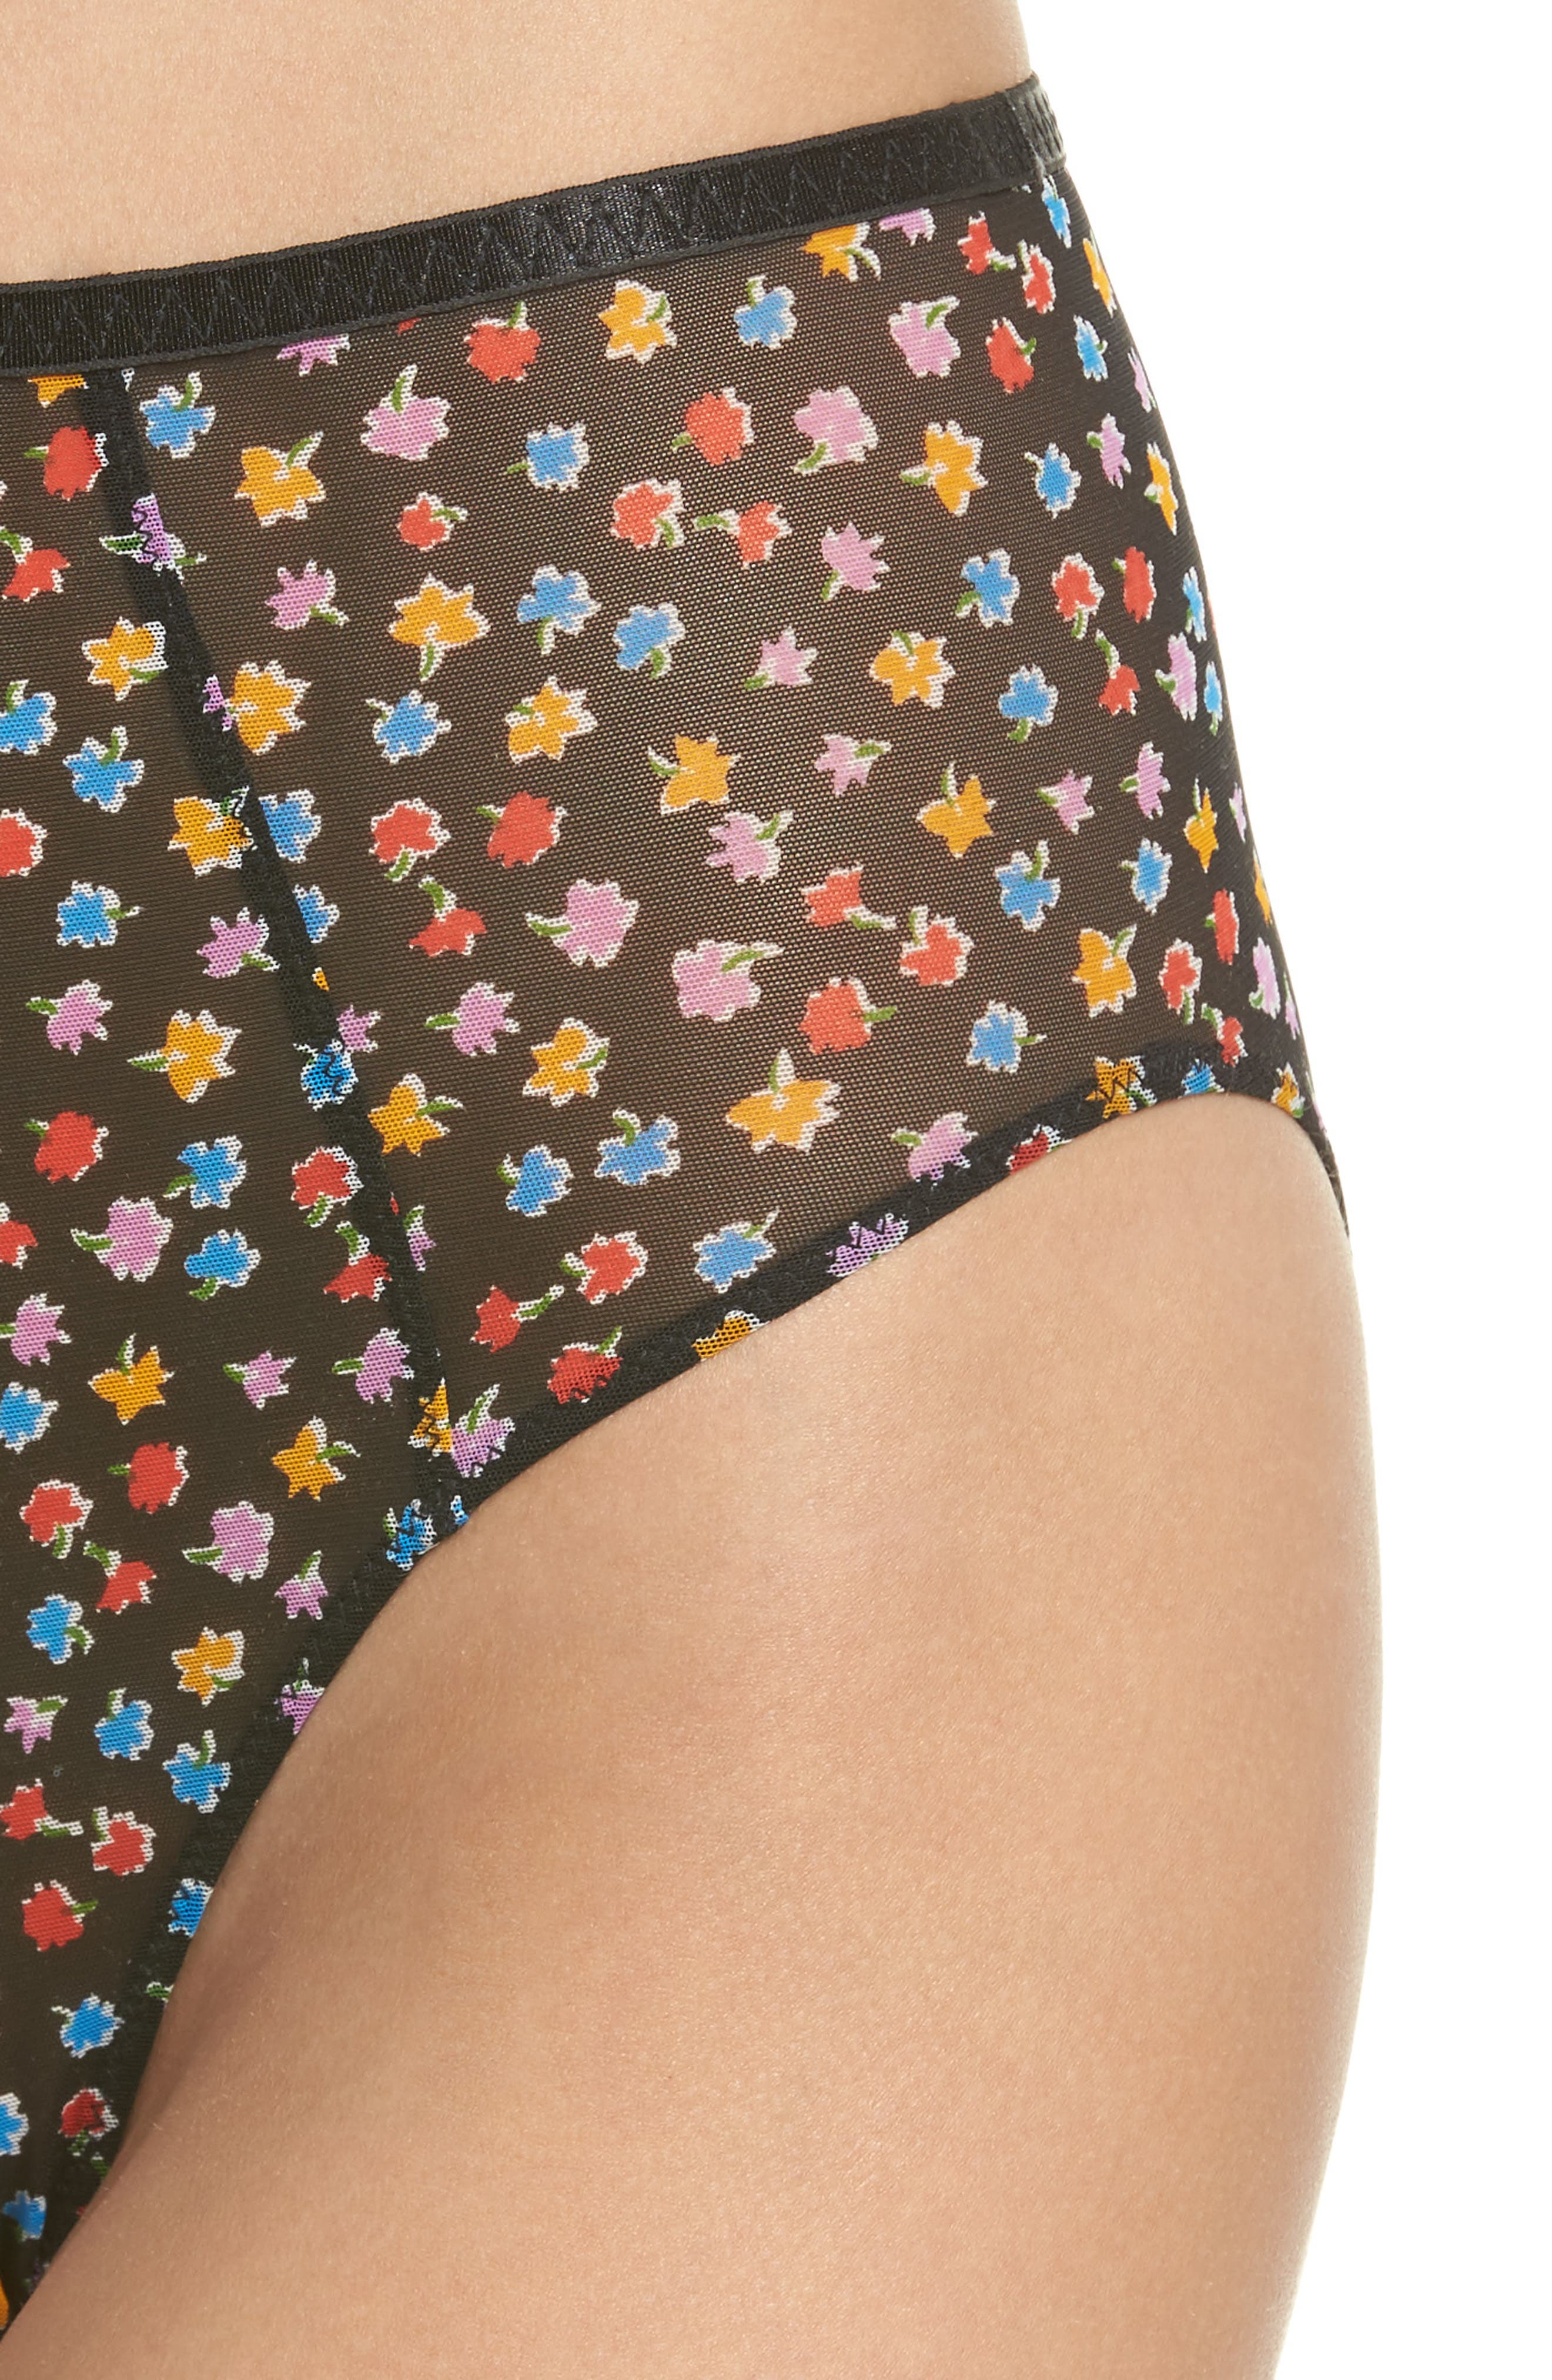 Intimately FP Capri High Waist Panties,                             Alternate thumbnail 7, color,                             Black Combo